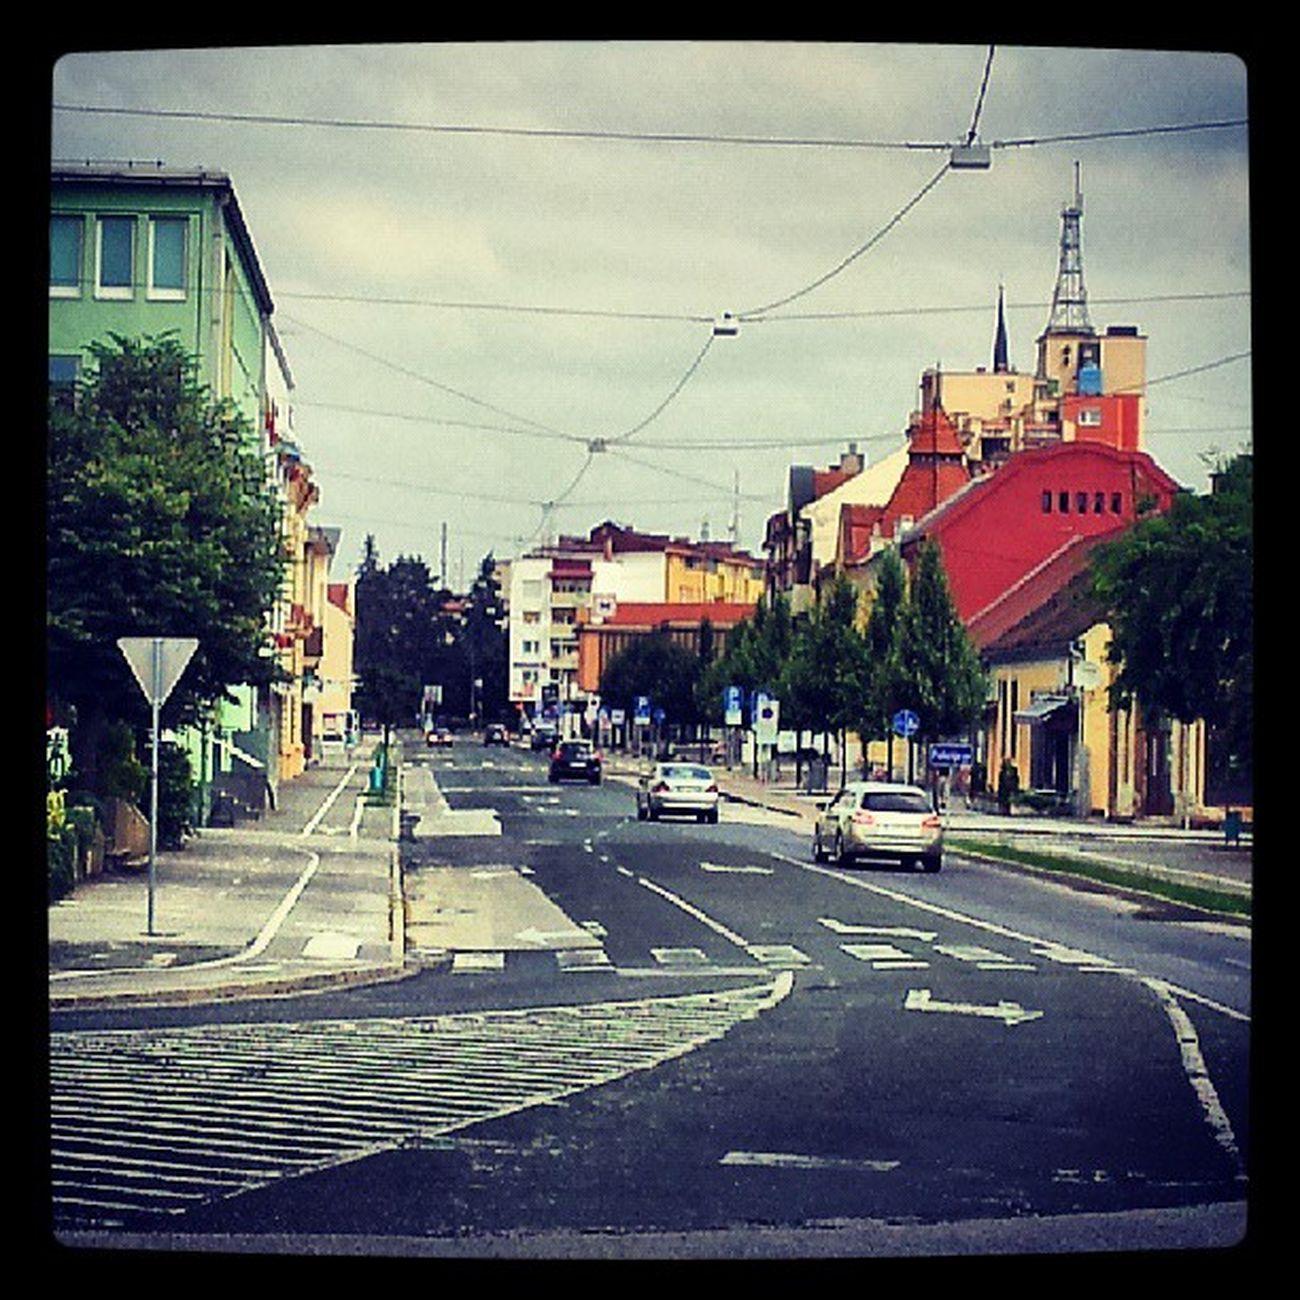 Igslovenia Murska Sobota Slovenská ulica titova glavna